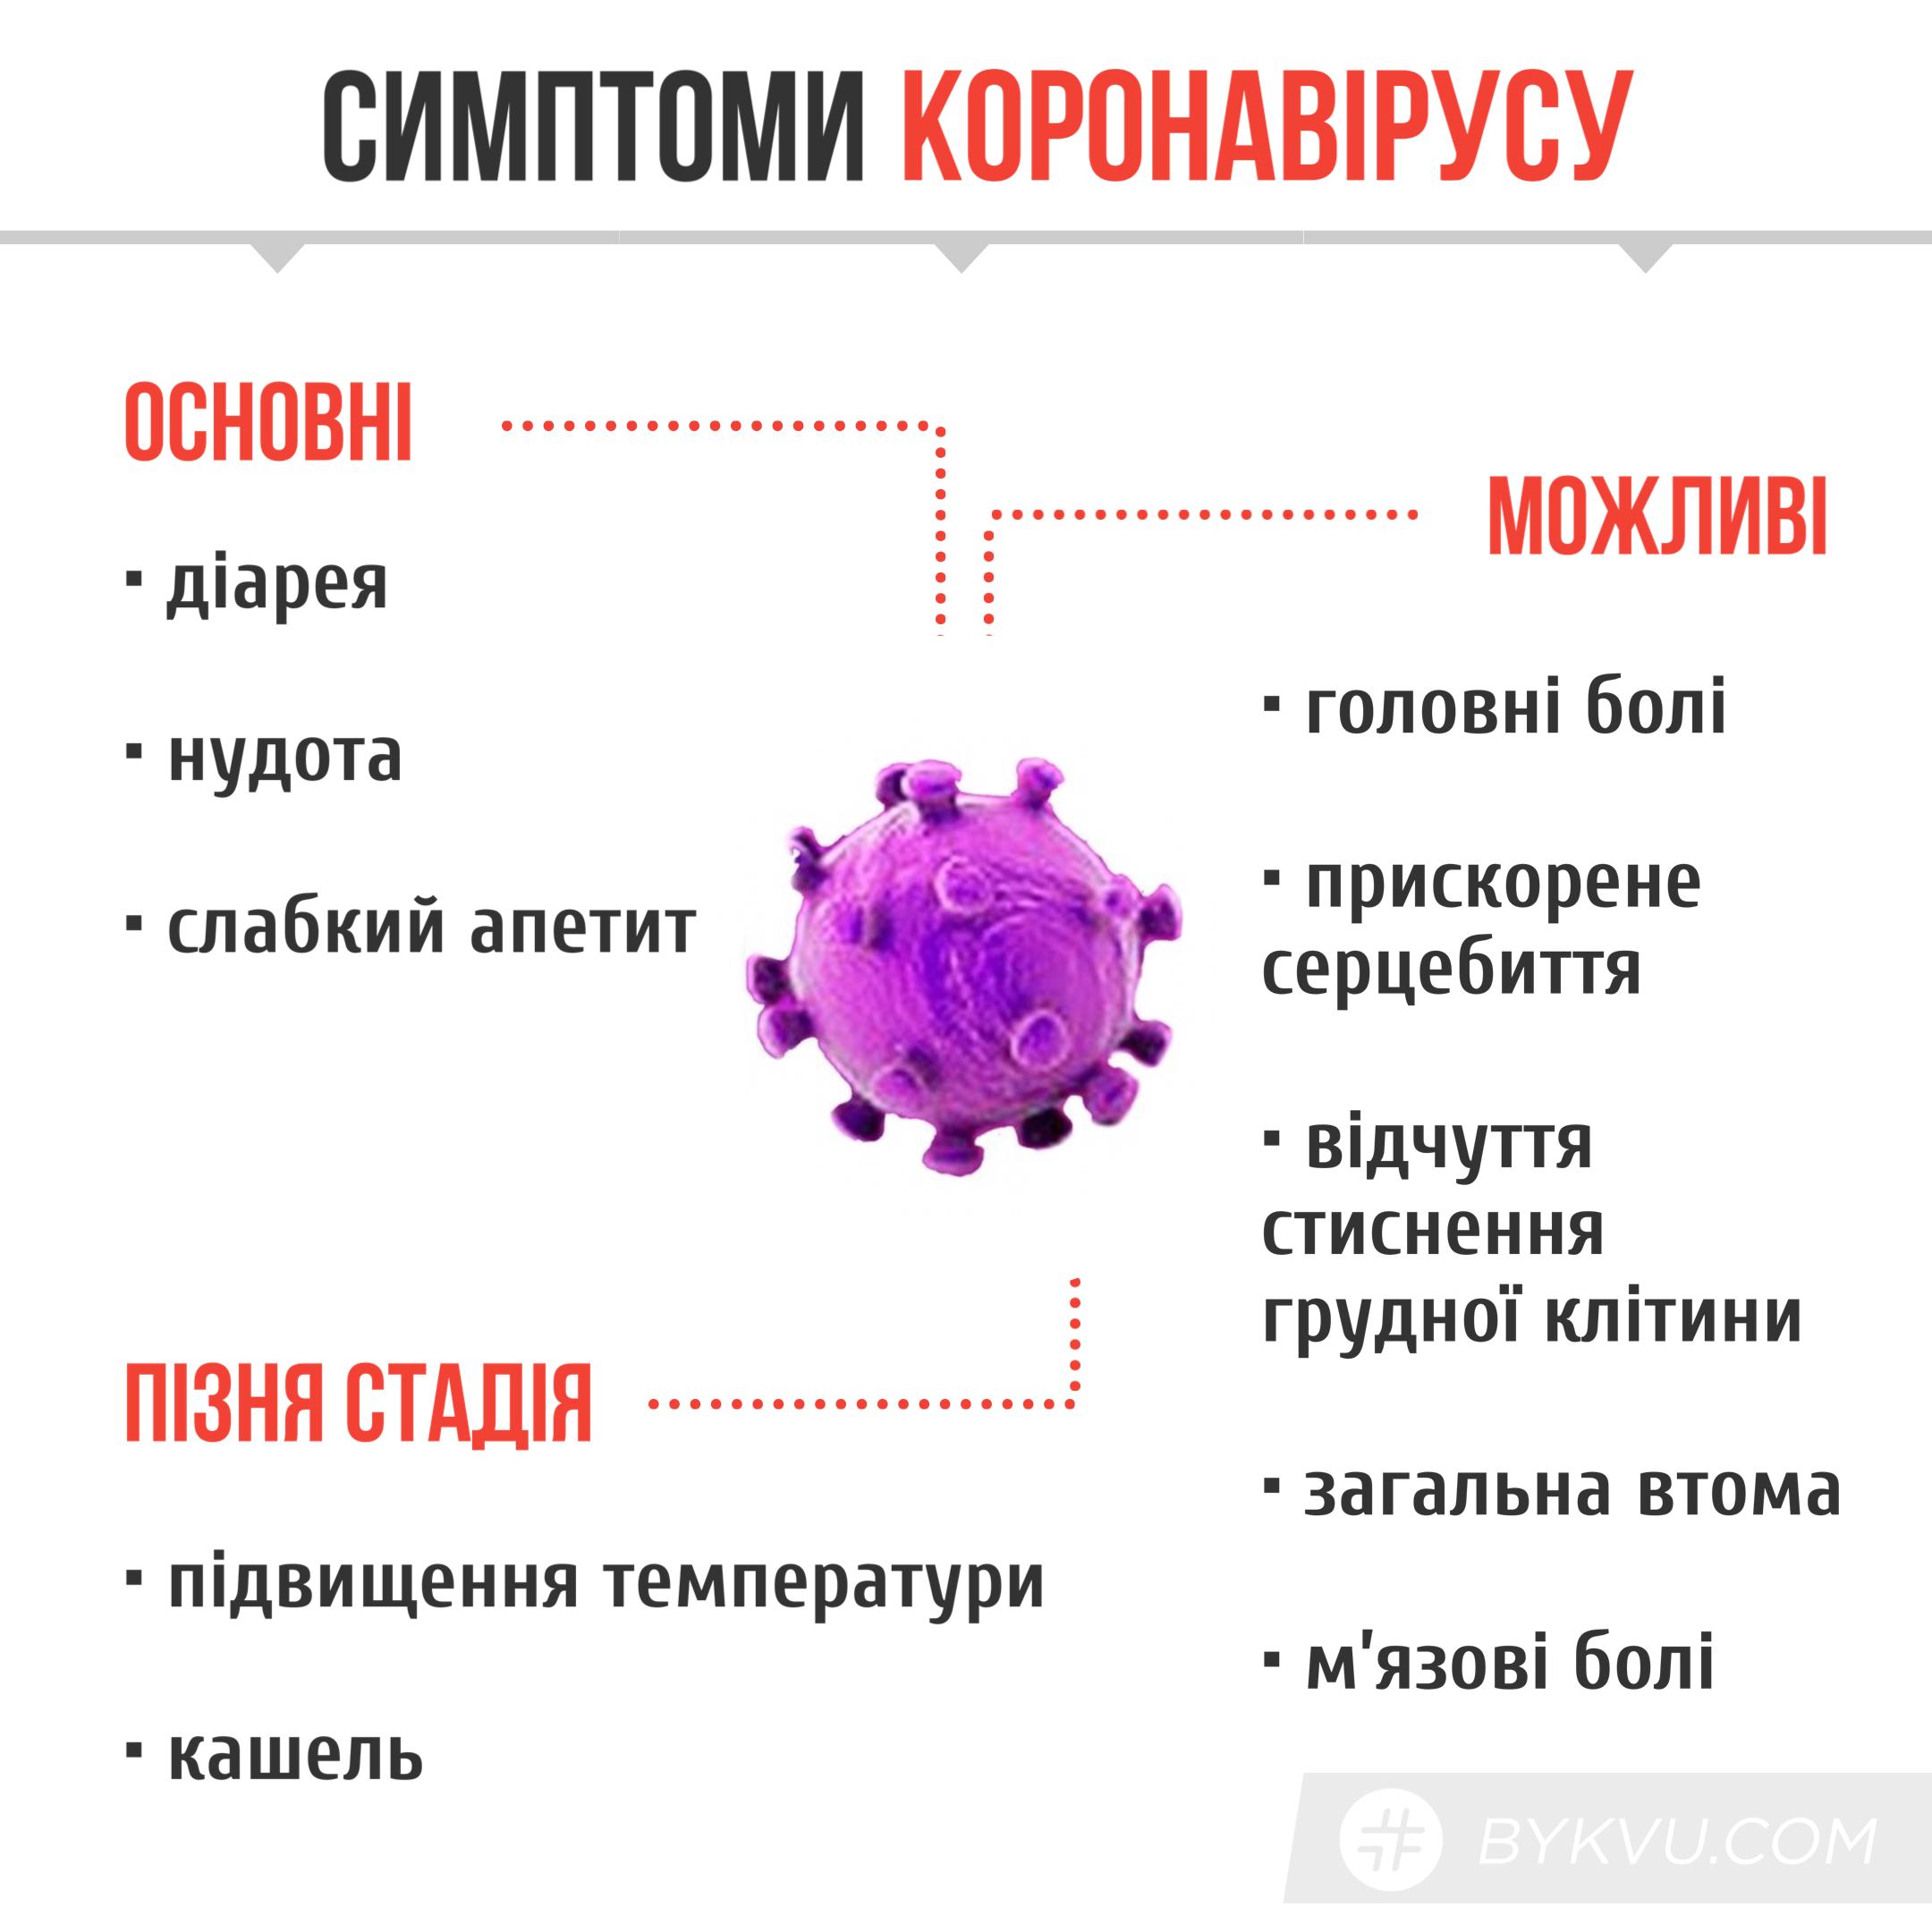 коронавирусом ncov